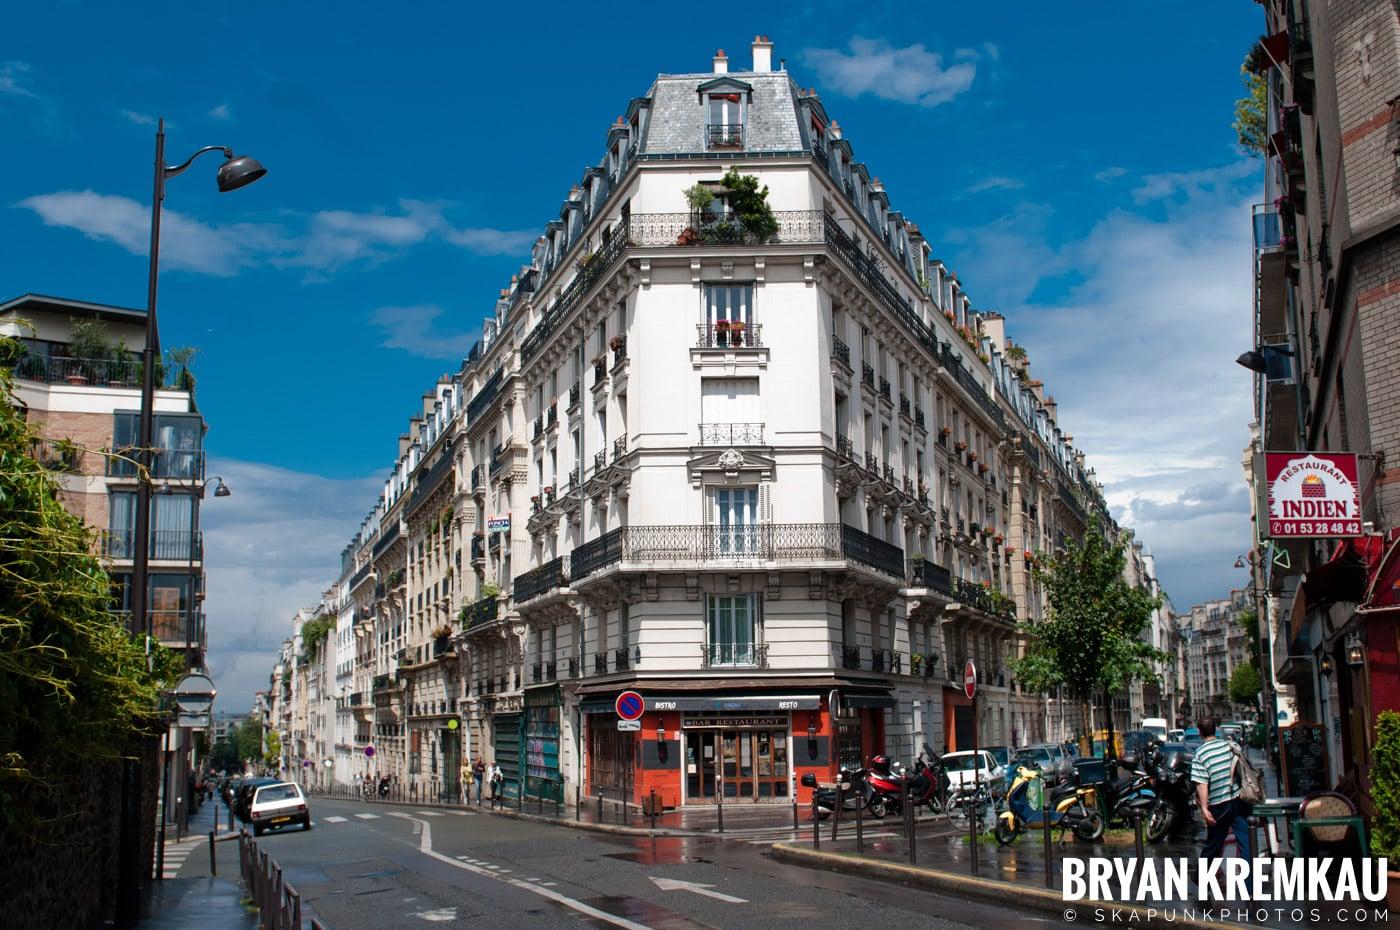 Paris, France Honeymoon - Day 6 - 7.23.11 (16)